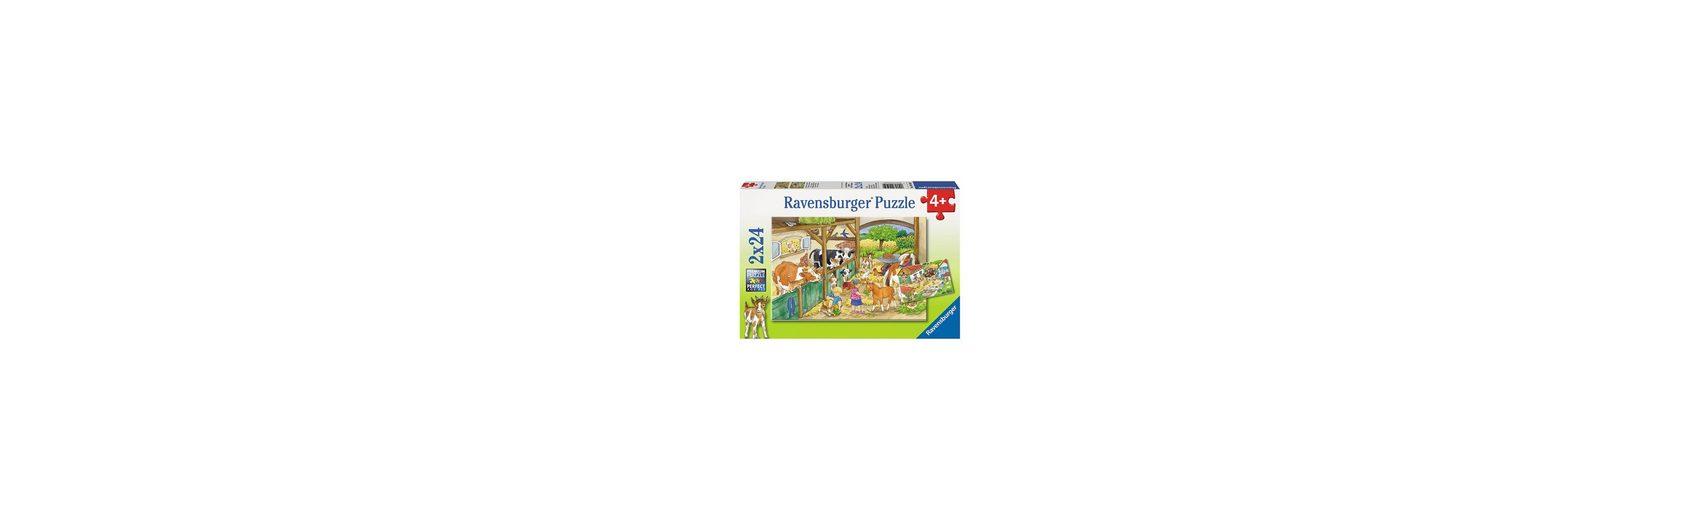 Ravensburger Puzzleset Fröhliches Landleben 2 x 24 Teile